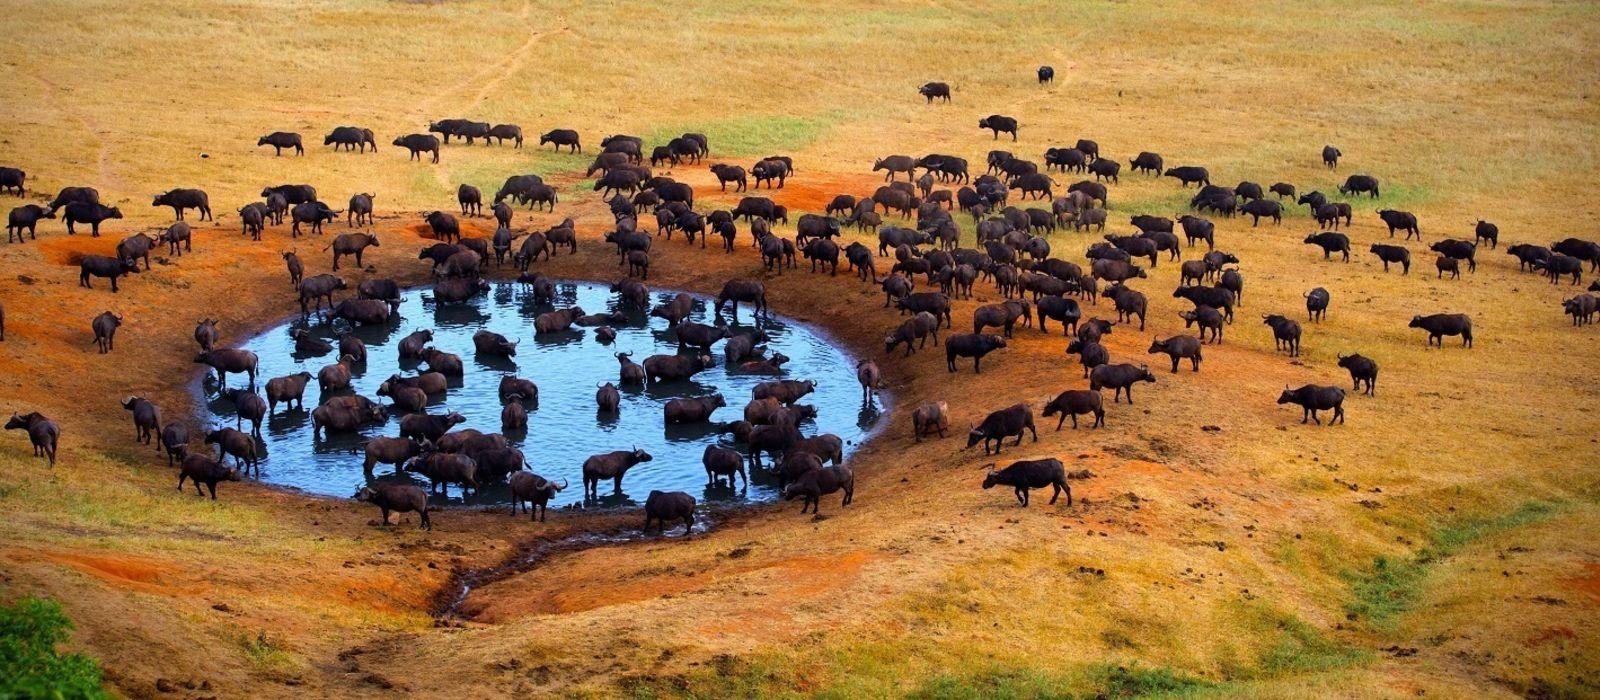 Kenia ganz Klassisch- Samburu, Masai Mara und Erholung am Strand Urlaub 4